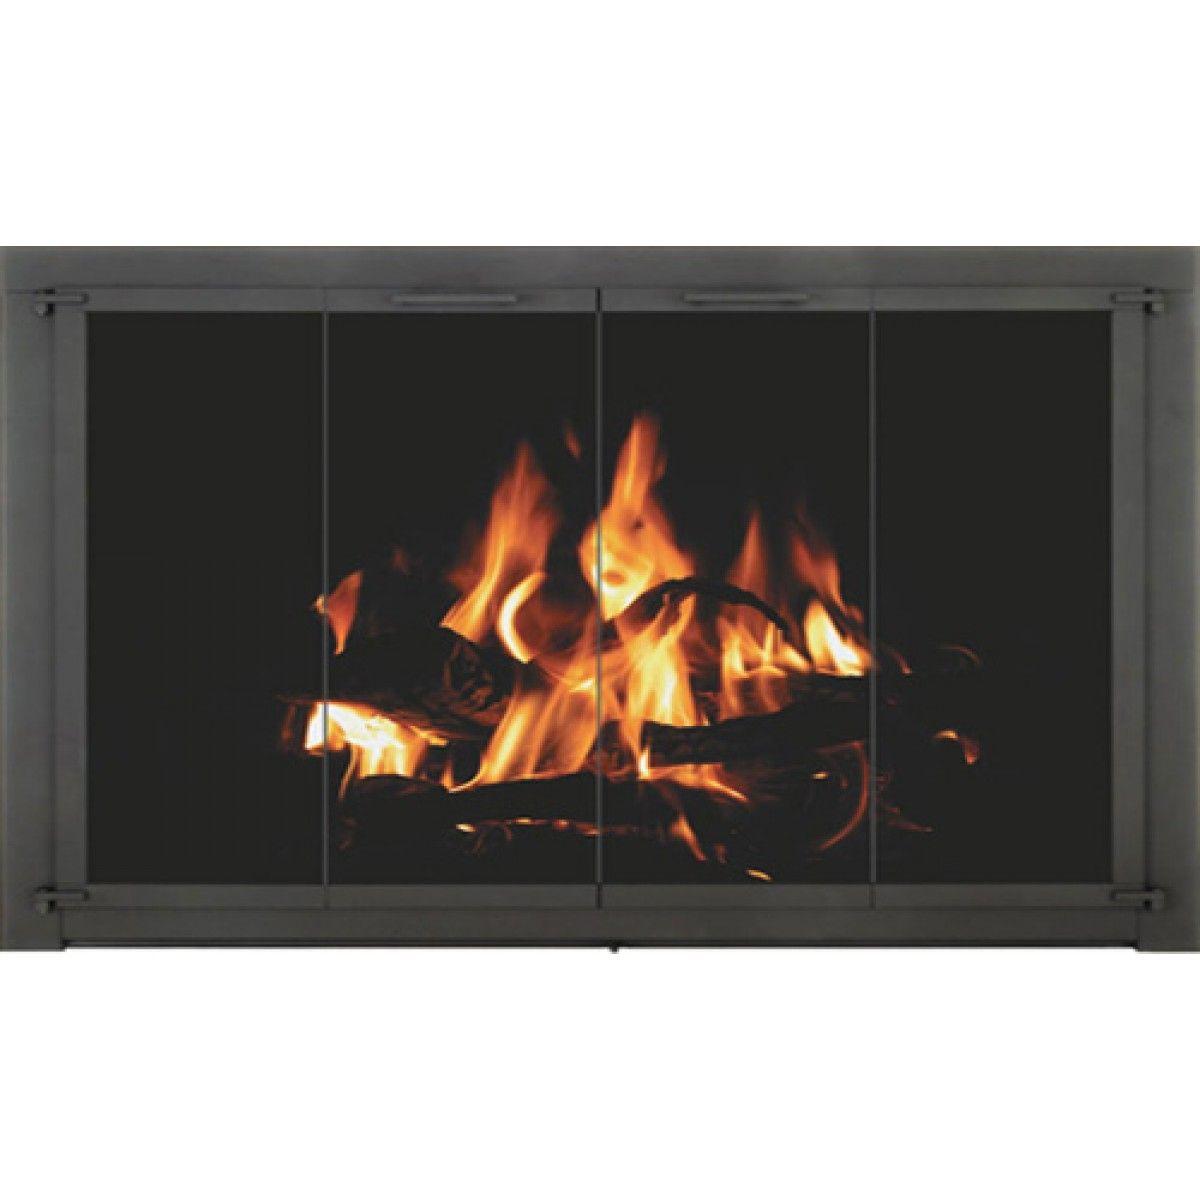 The Crestone For Heat N Glo Fireplaces Heat N Glo Fireplace Doors